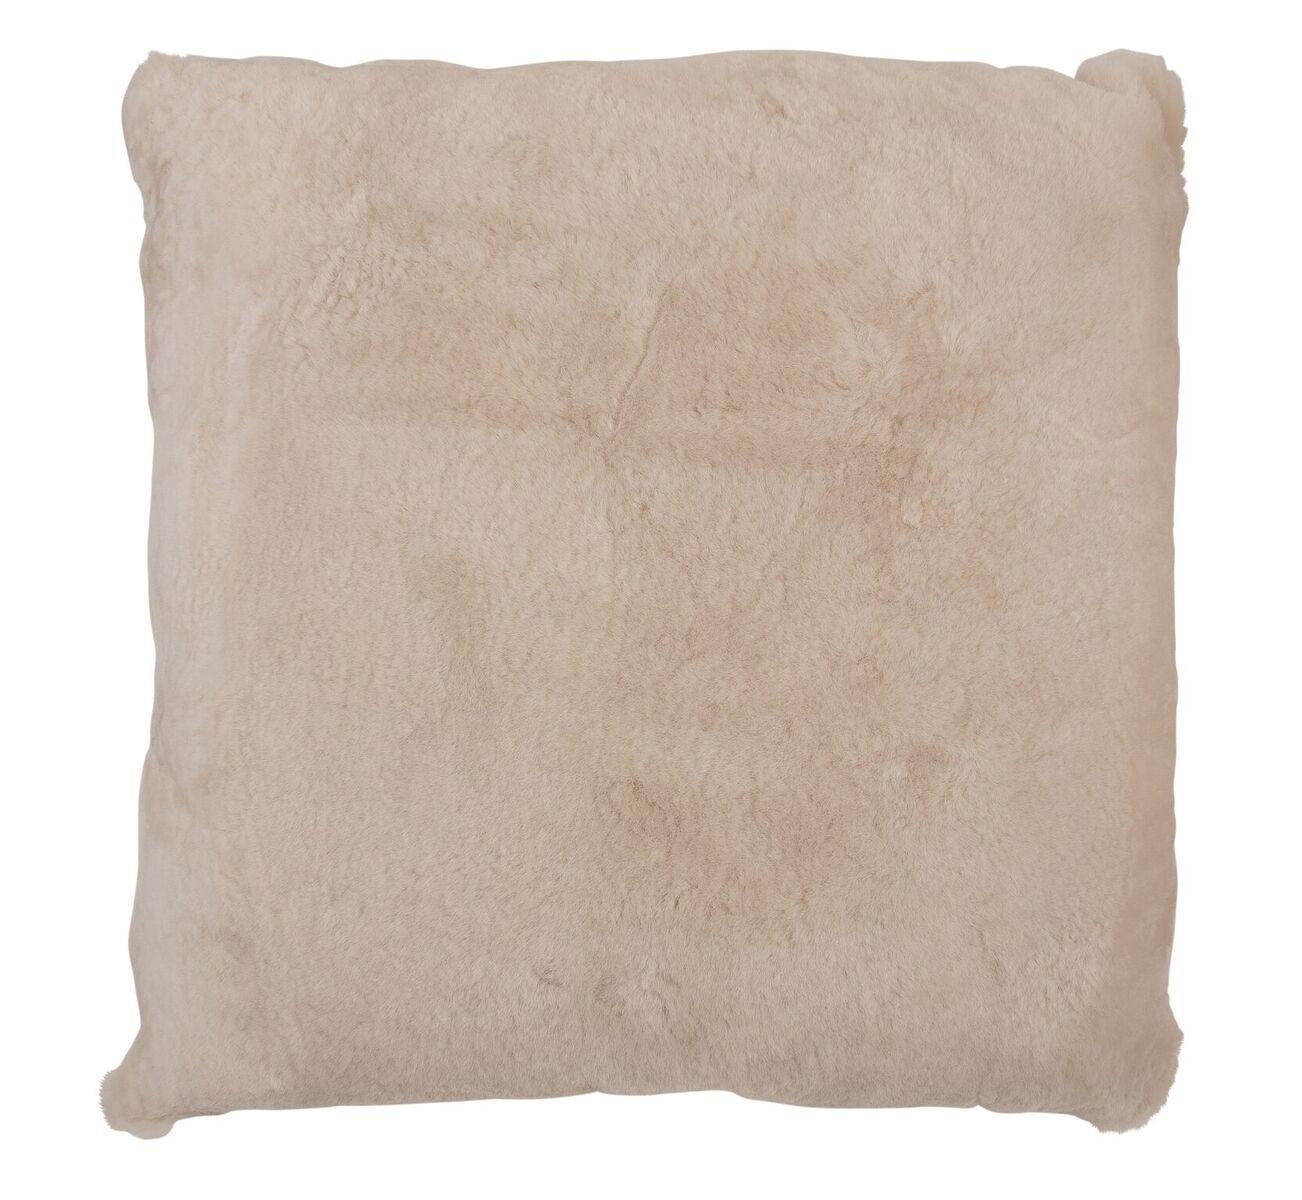 lambswool recliner chair covers australia eiffel tower fibre by auskin sheepskin pillows 22 shearling throw